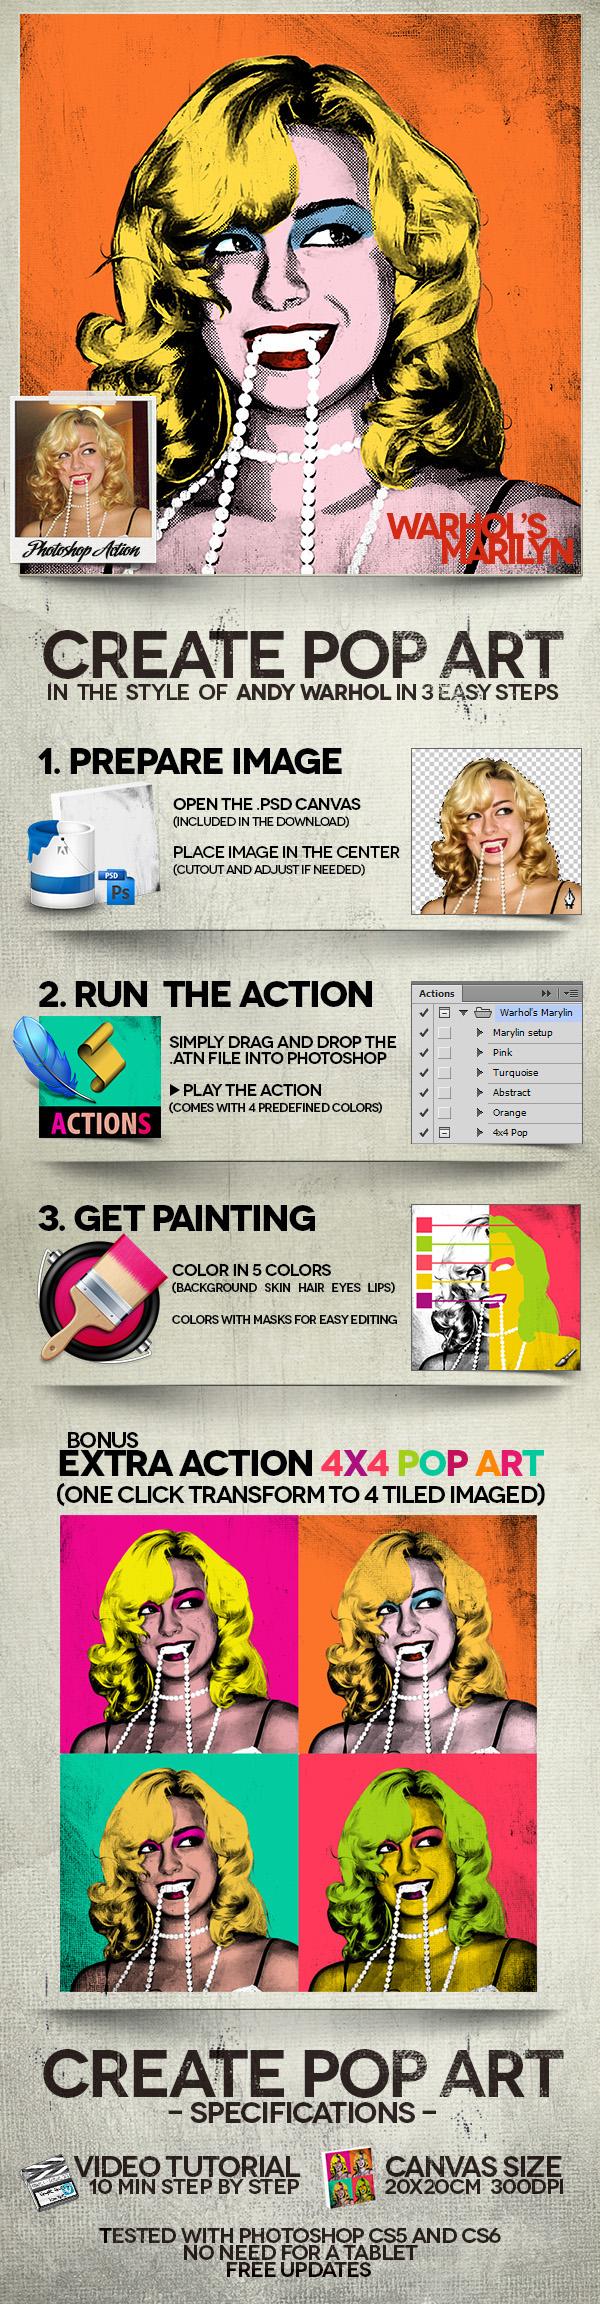 25 Photoshop Tutorials for Creating Pop-Art